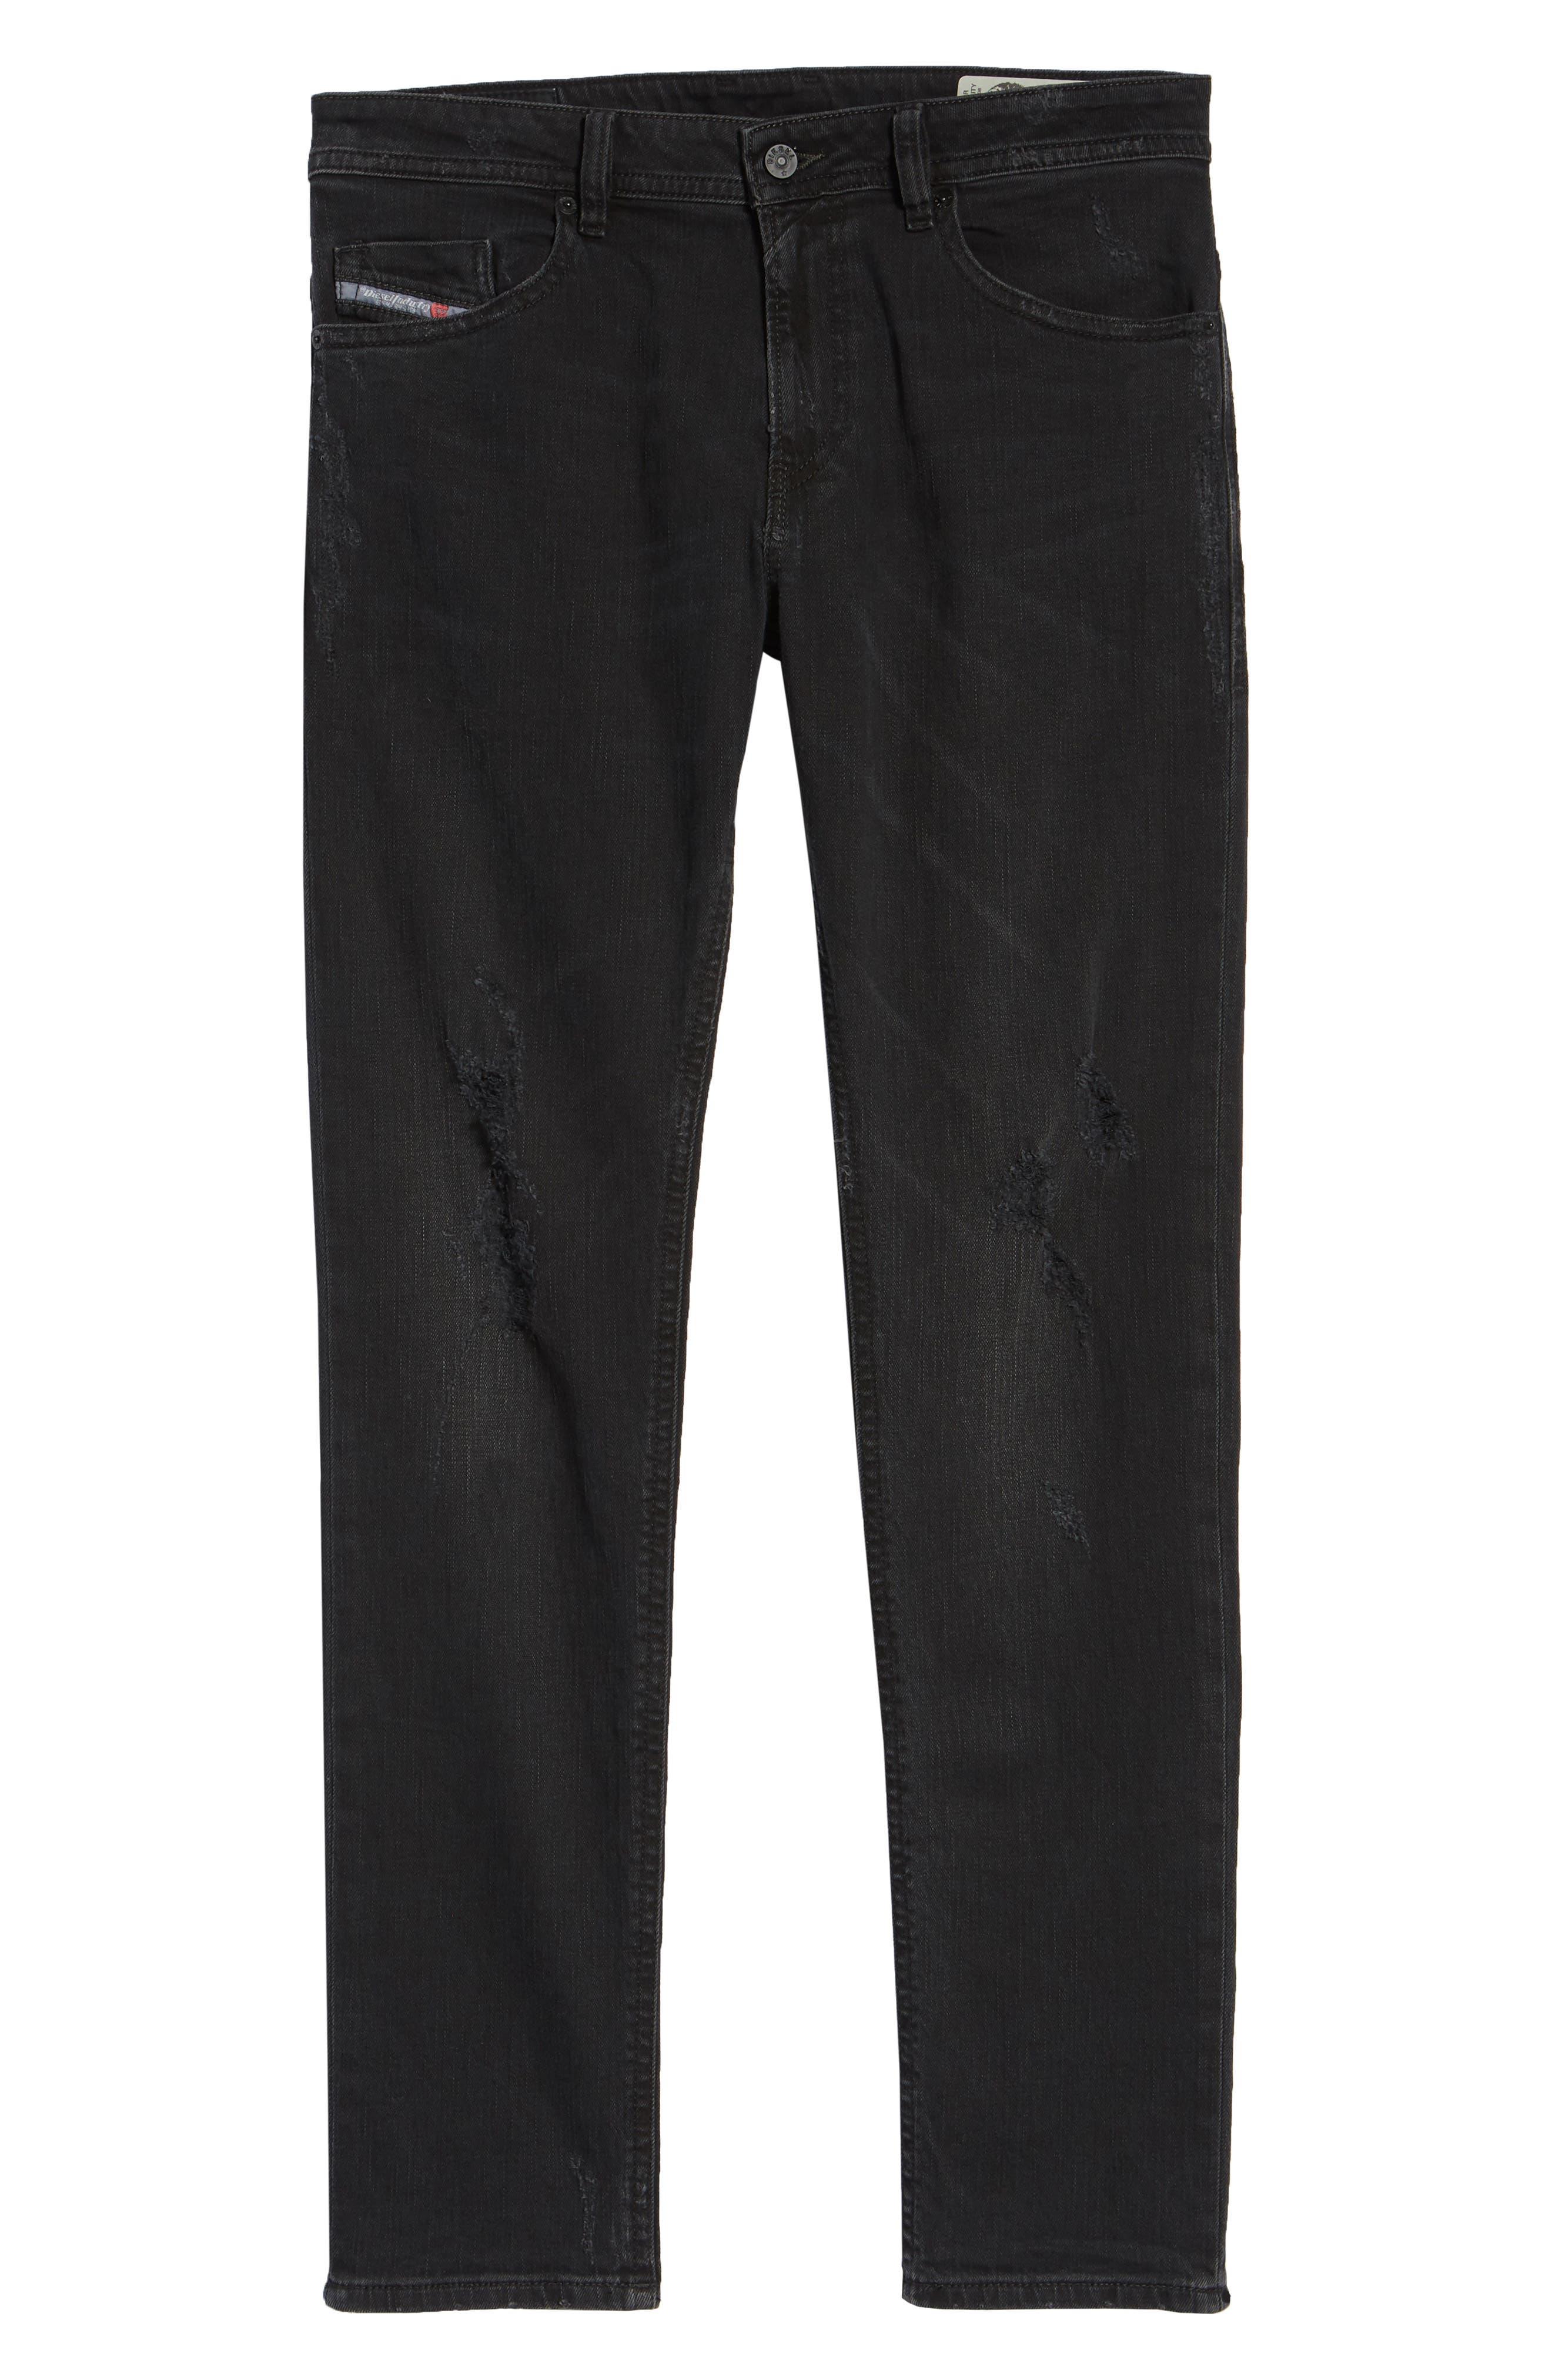 Thommer Skinny Fit Jeans,                             Alternate thumbnail 6, color,                             CN013